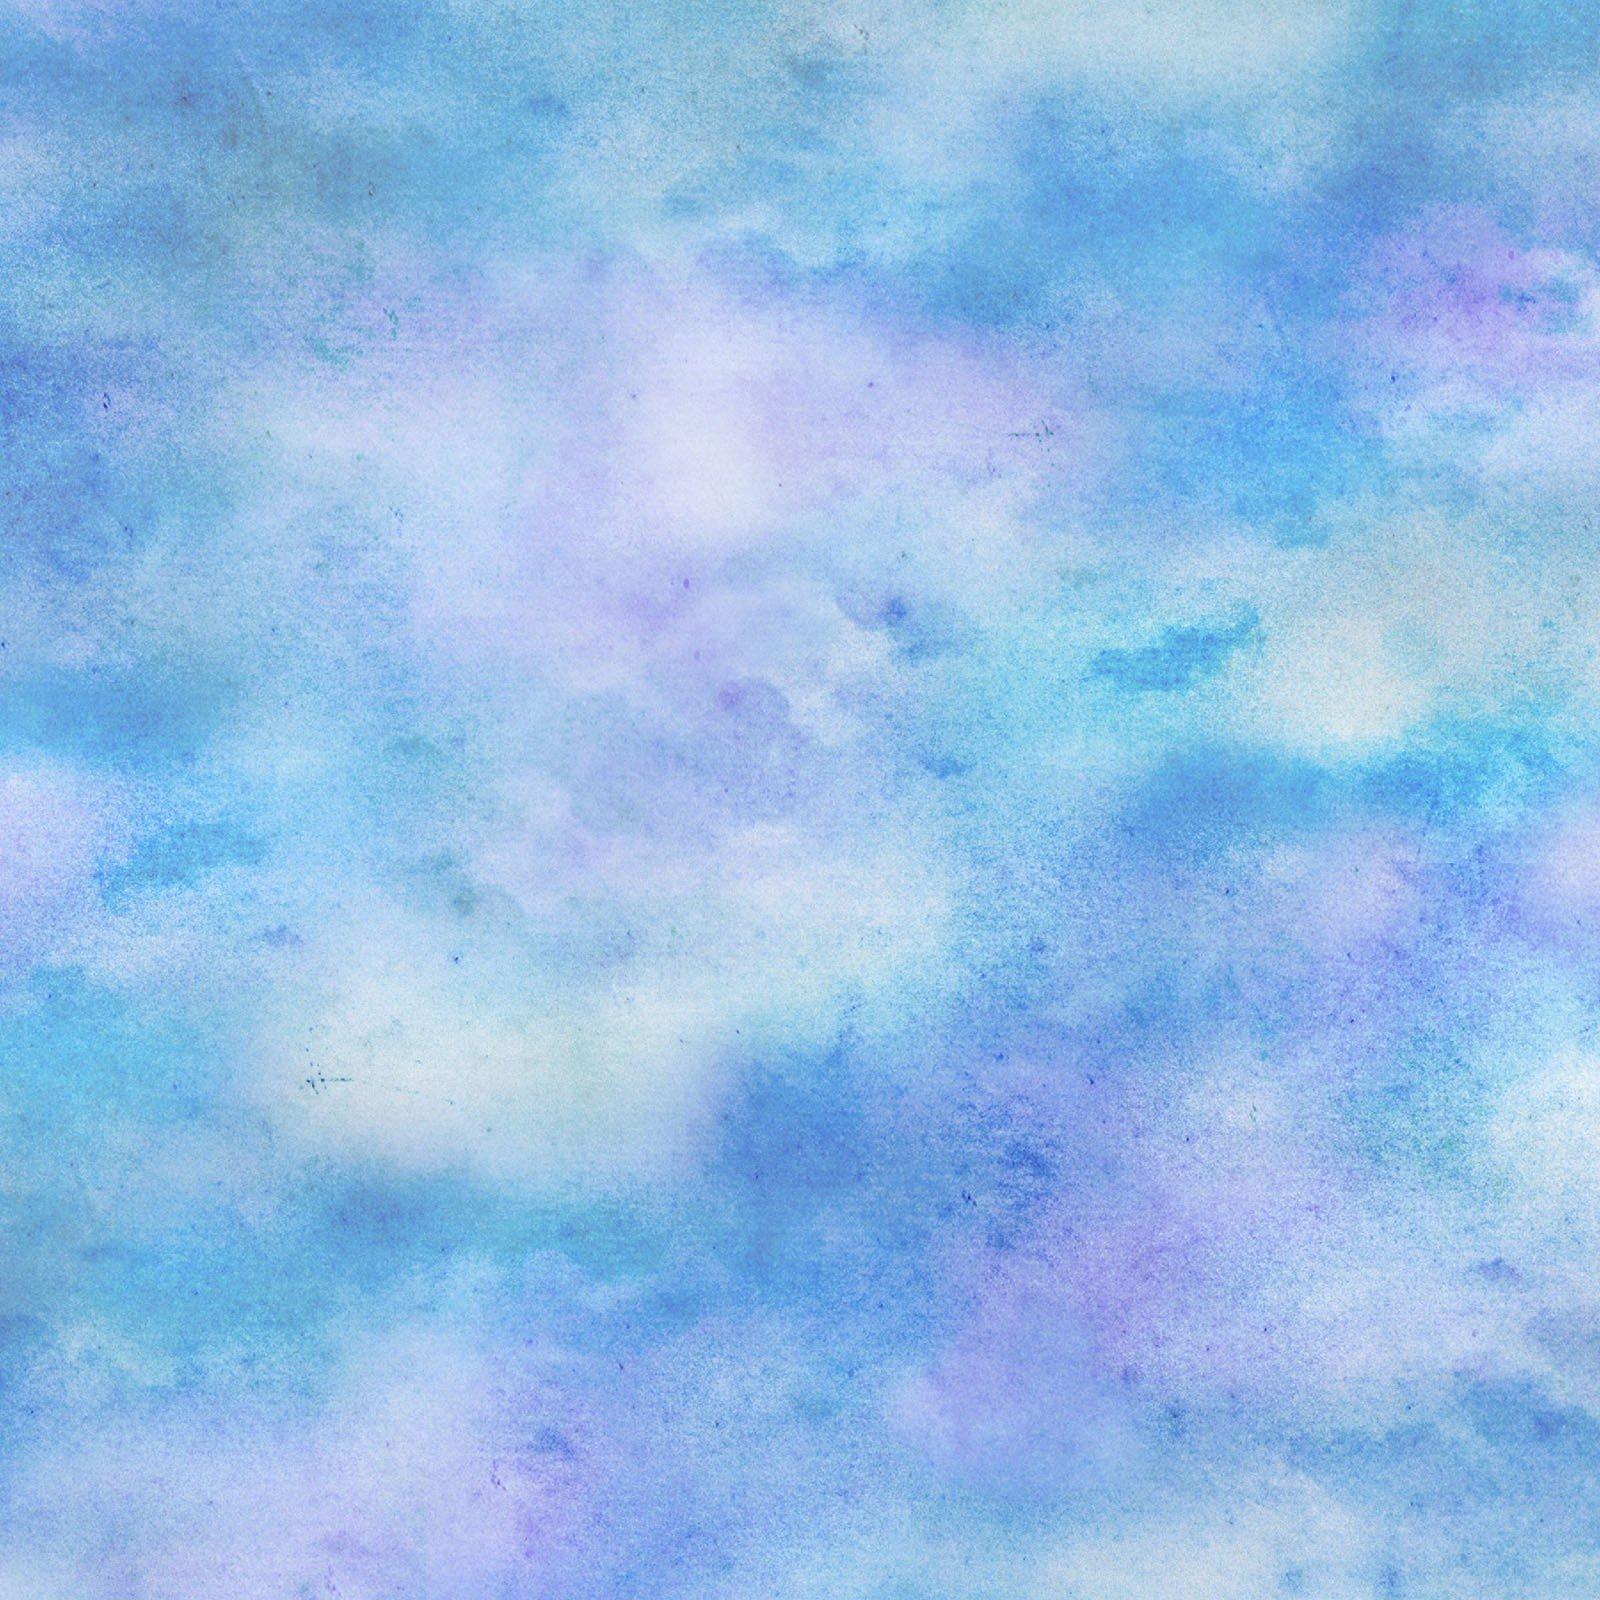 Color Splash Digital - Texture - Blue